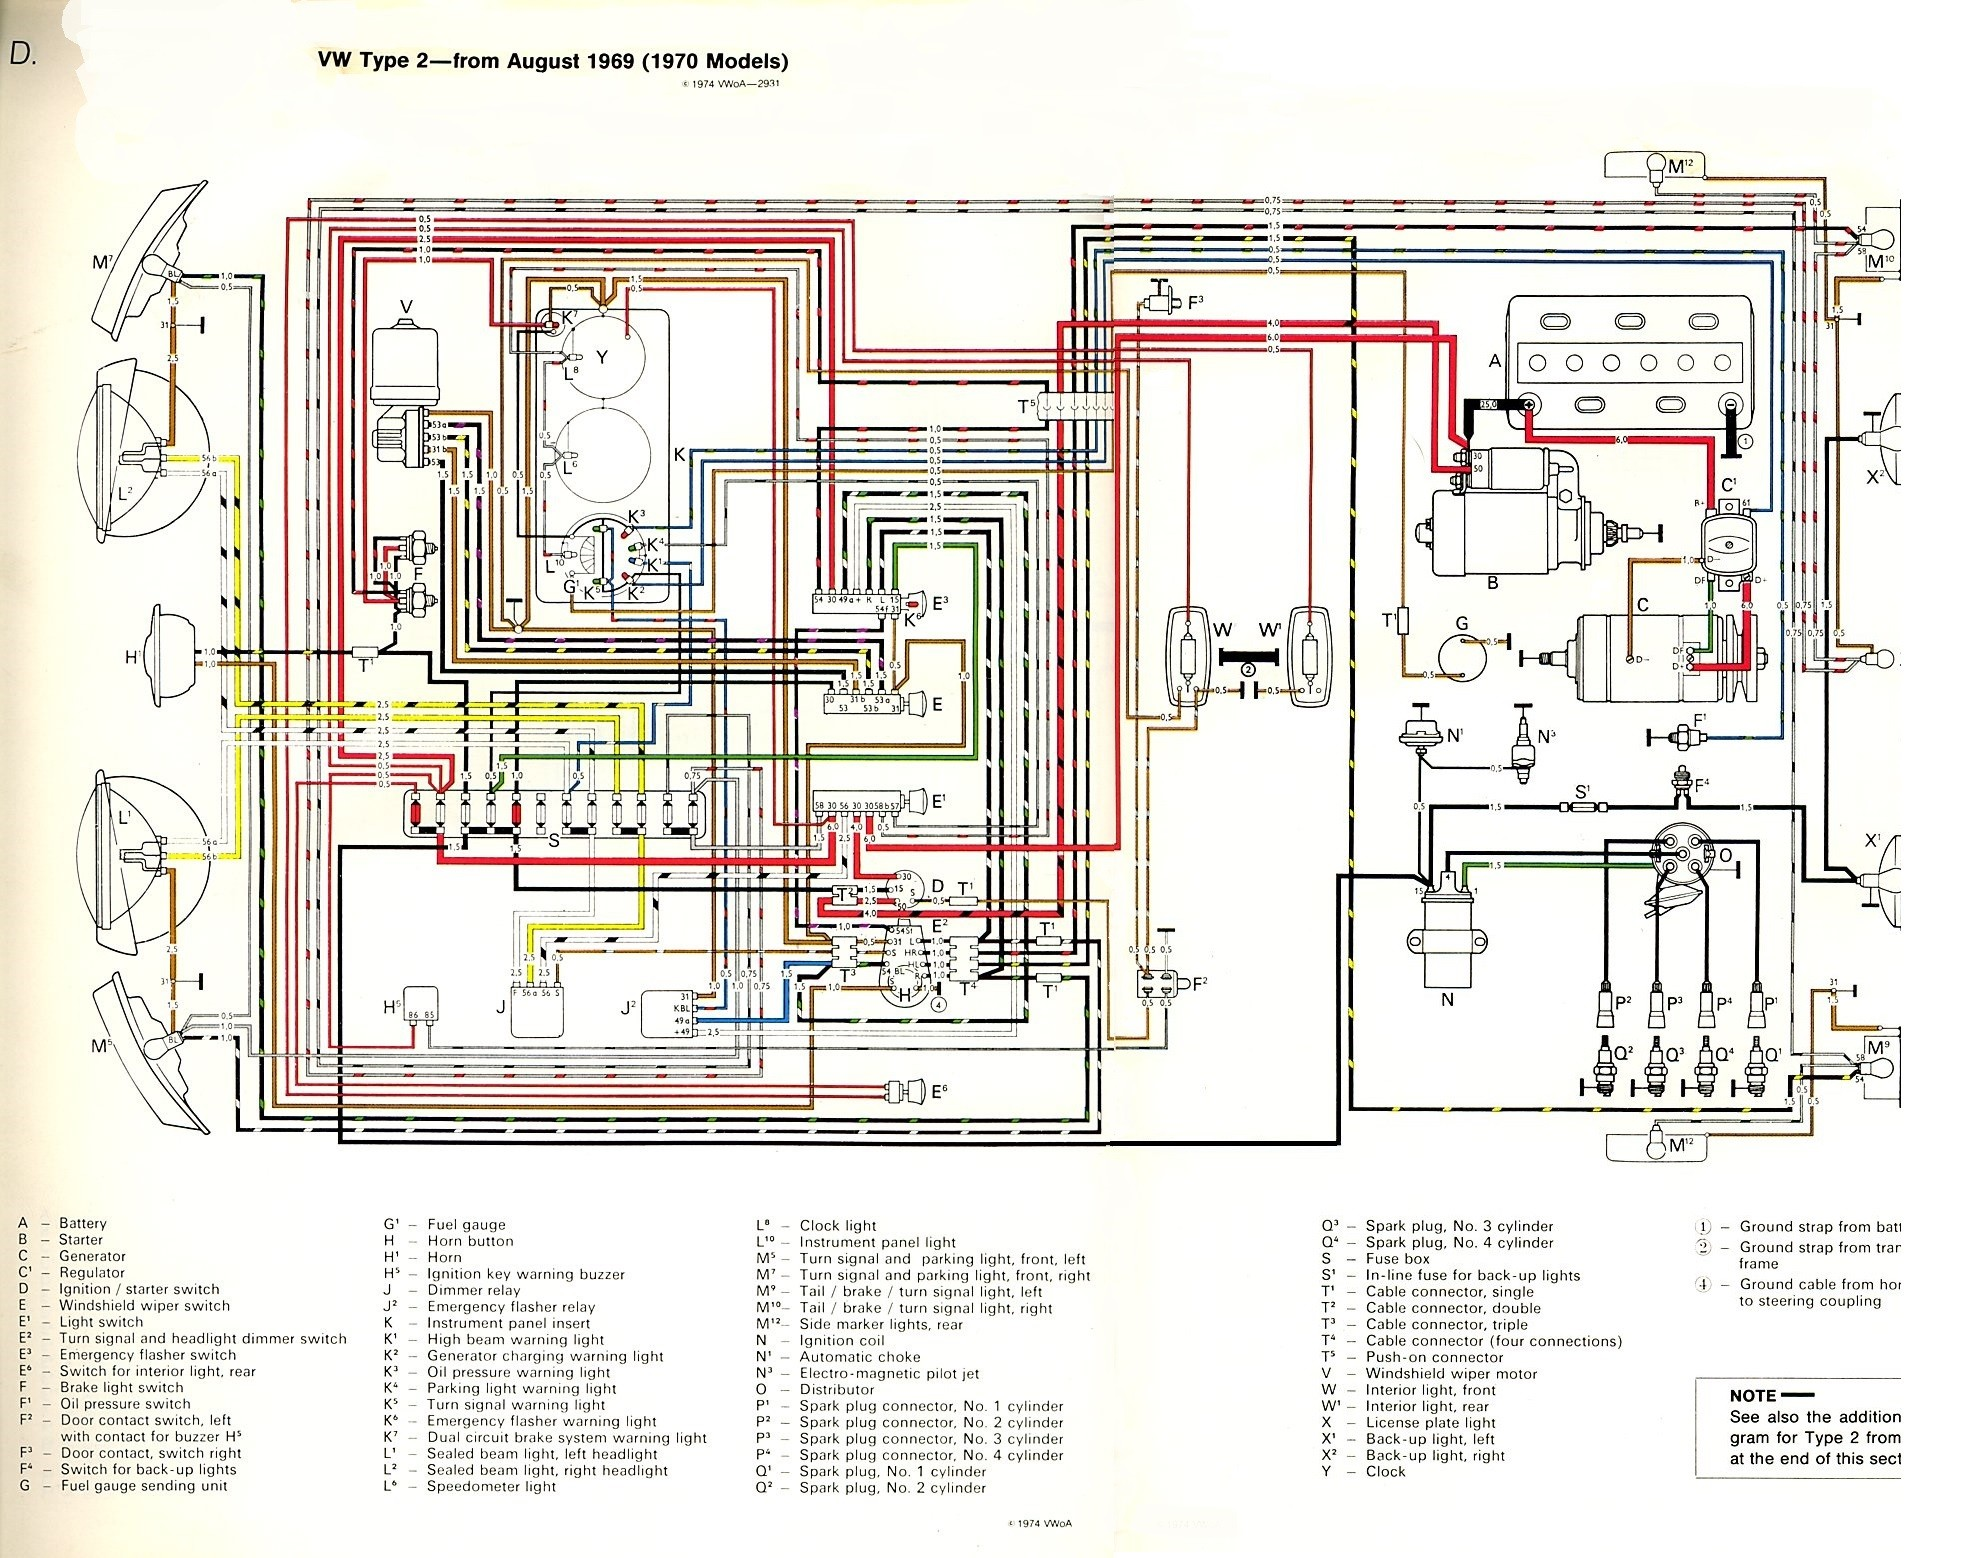 1967 Firebird Wiring Diagram 1967 Camaro Wiring Harness Wiring Diagram Of 1967 Firebird Wiring Diagram